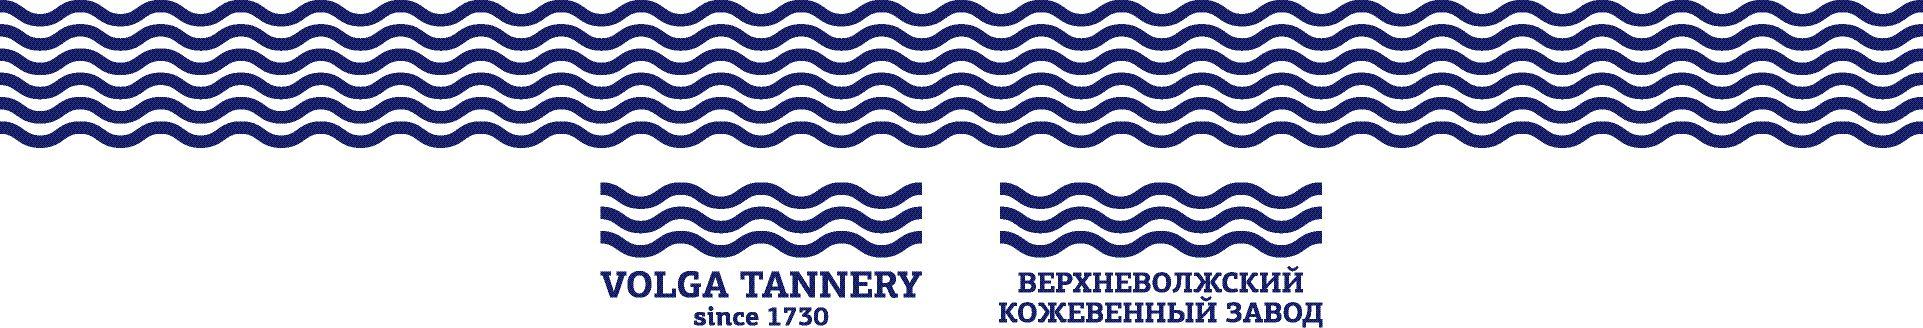 JSC Volga Tannery